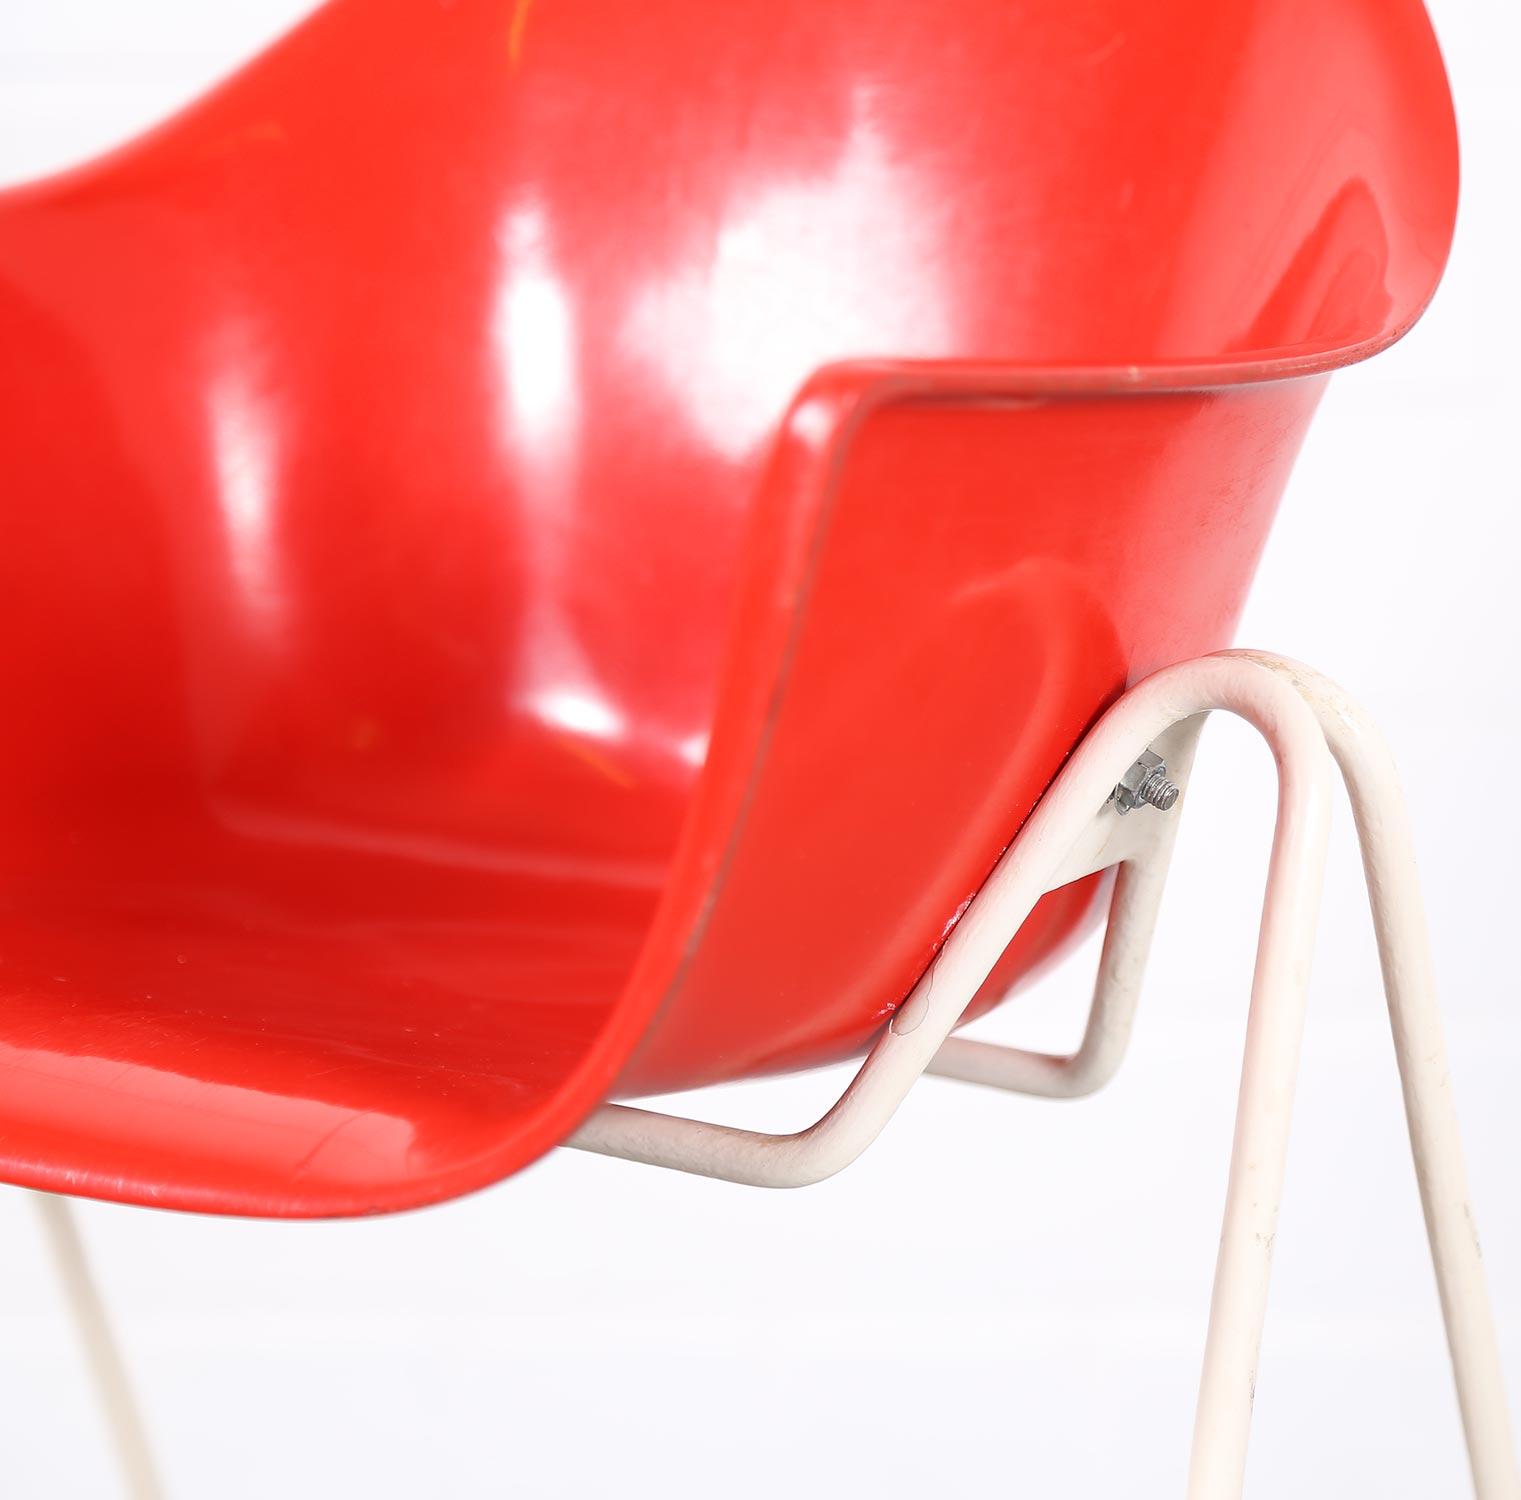 Kinder hochstuhl kids chair walter papst wilkhahn 60er for Designklassiker gebraucht